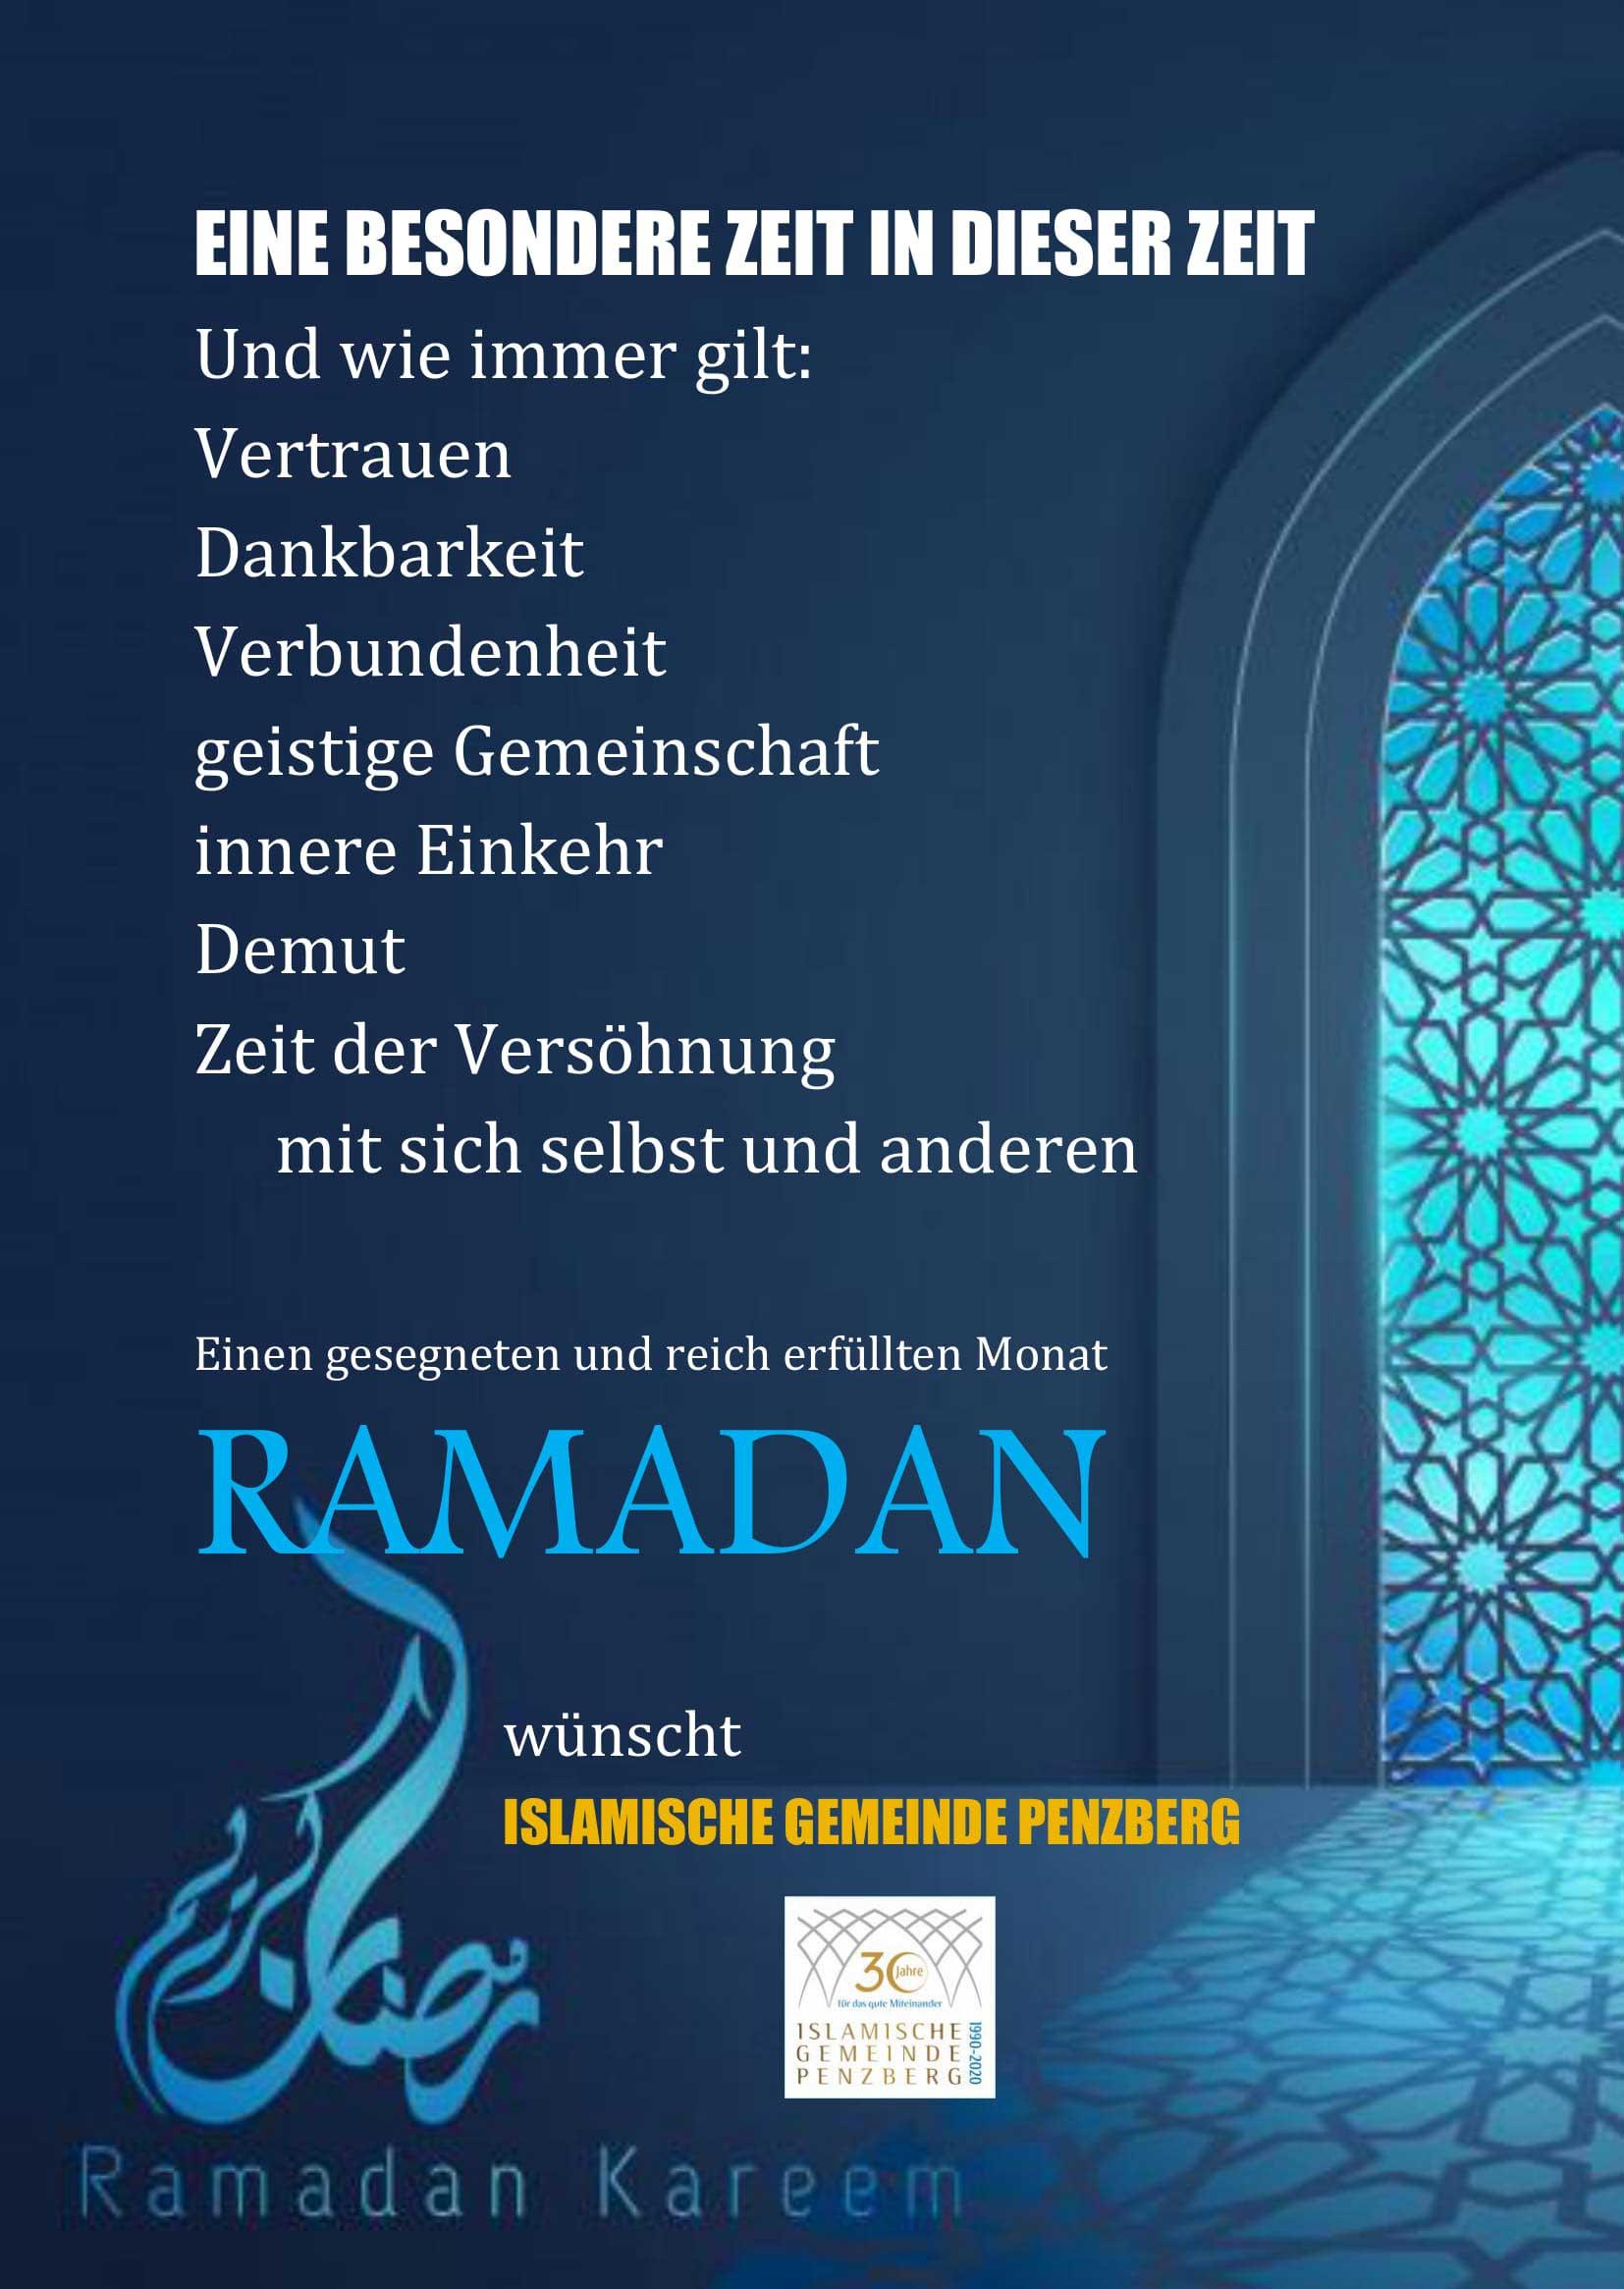 IGP Blog: Ramadan 2020